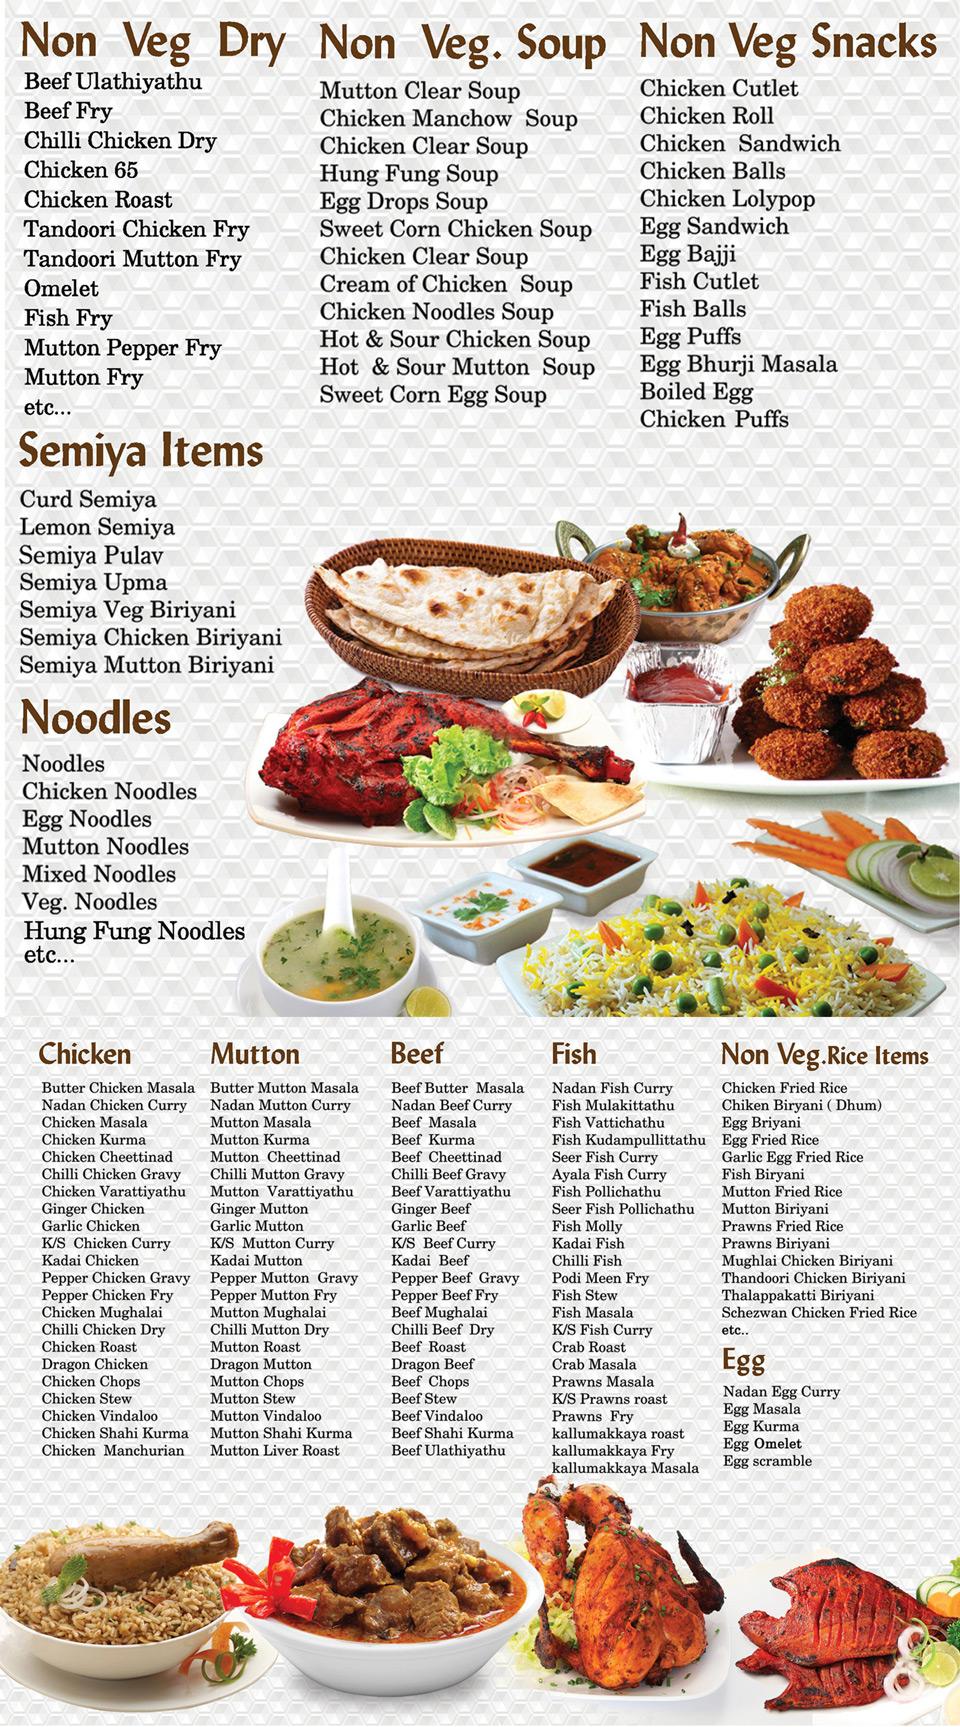 Break fast snacks catering palakkad non veg food items forumfinder Choice Image